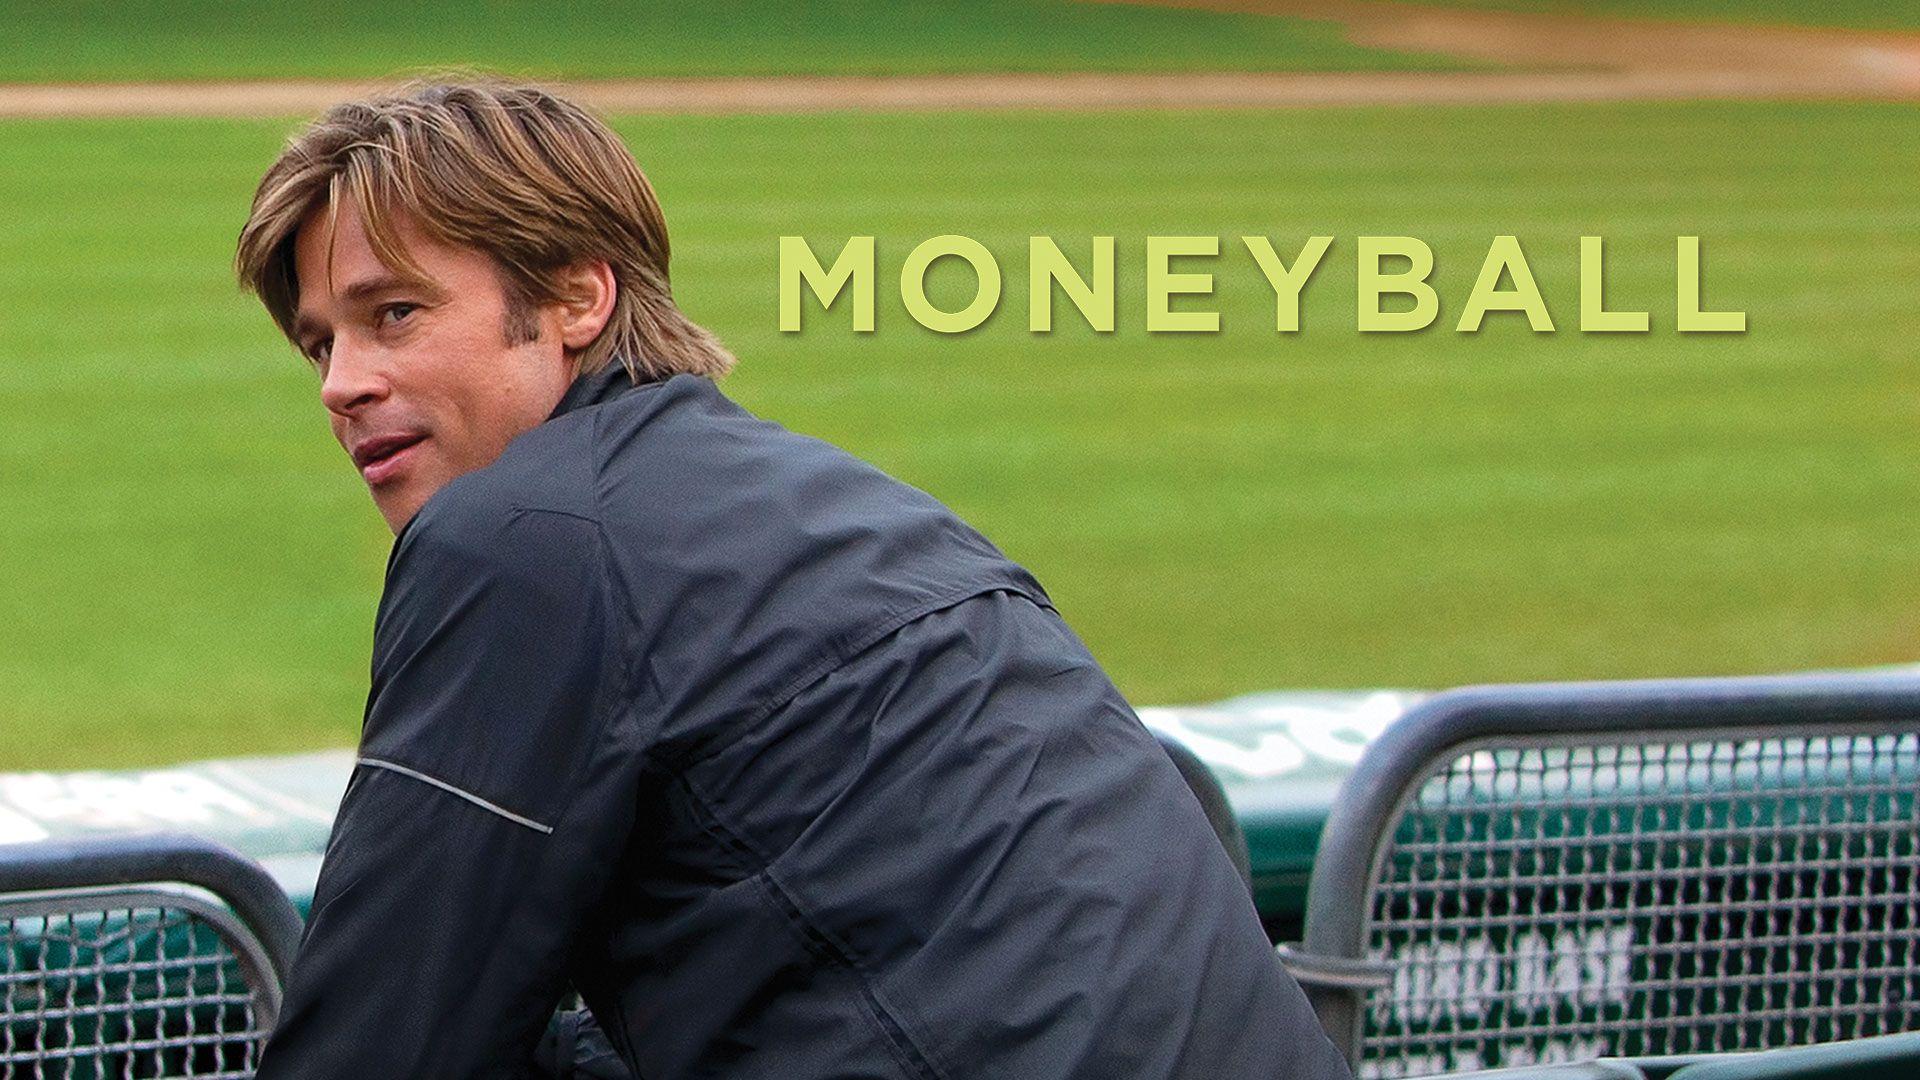 Moneyball (4K UHD)